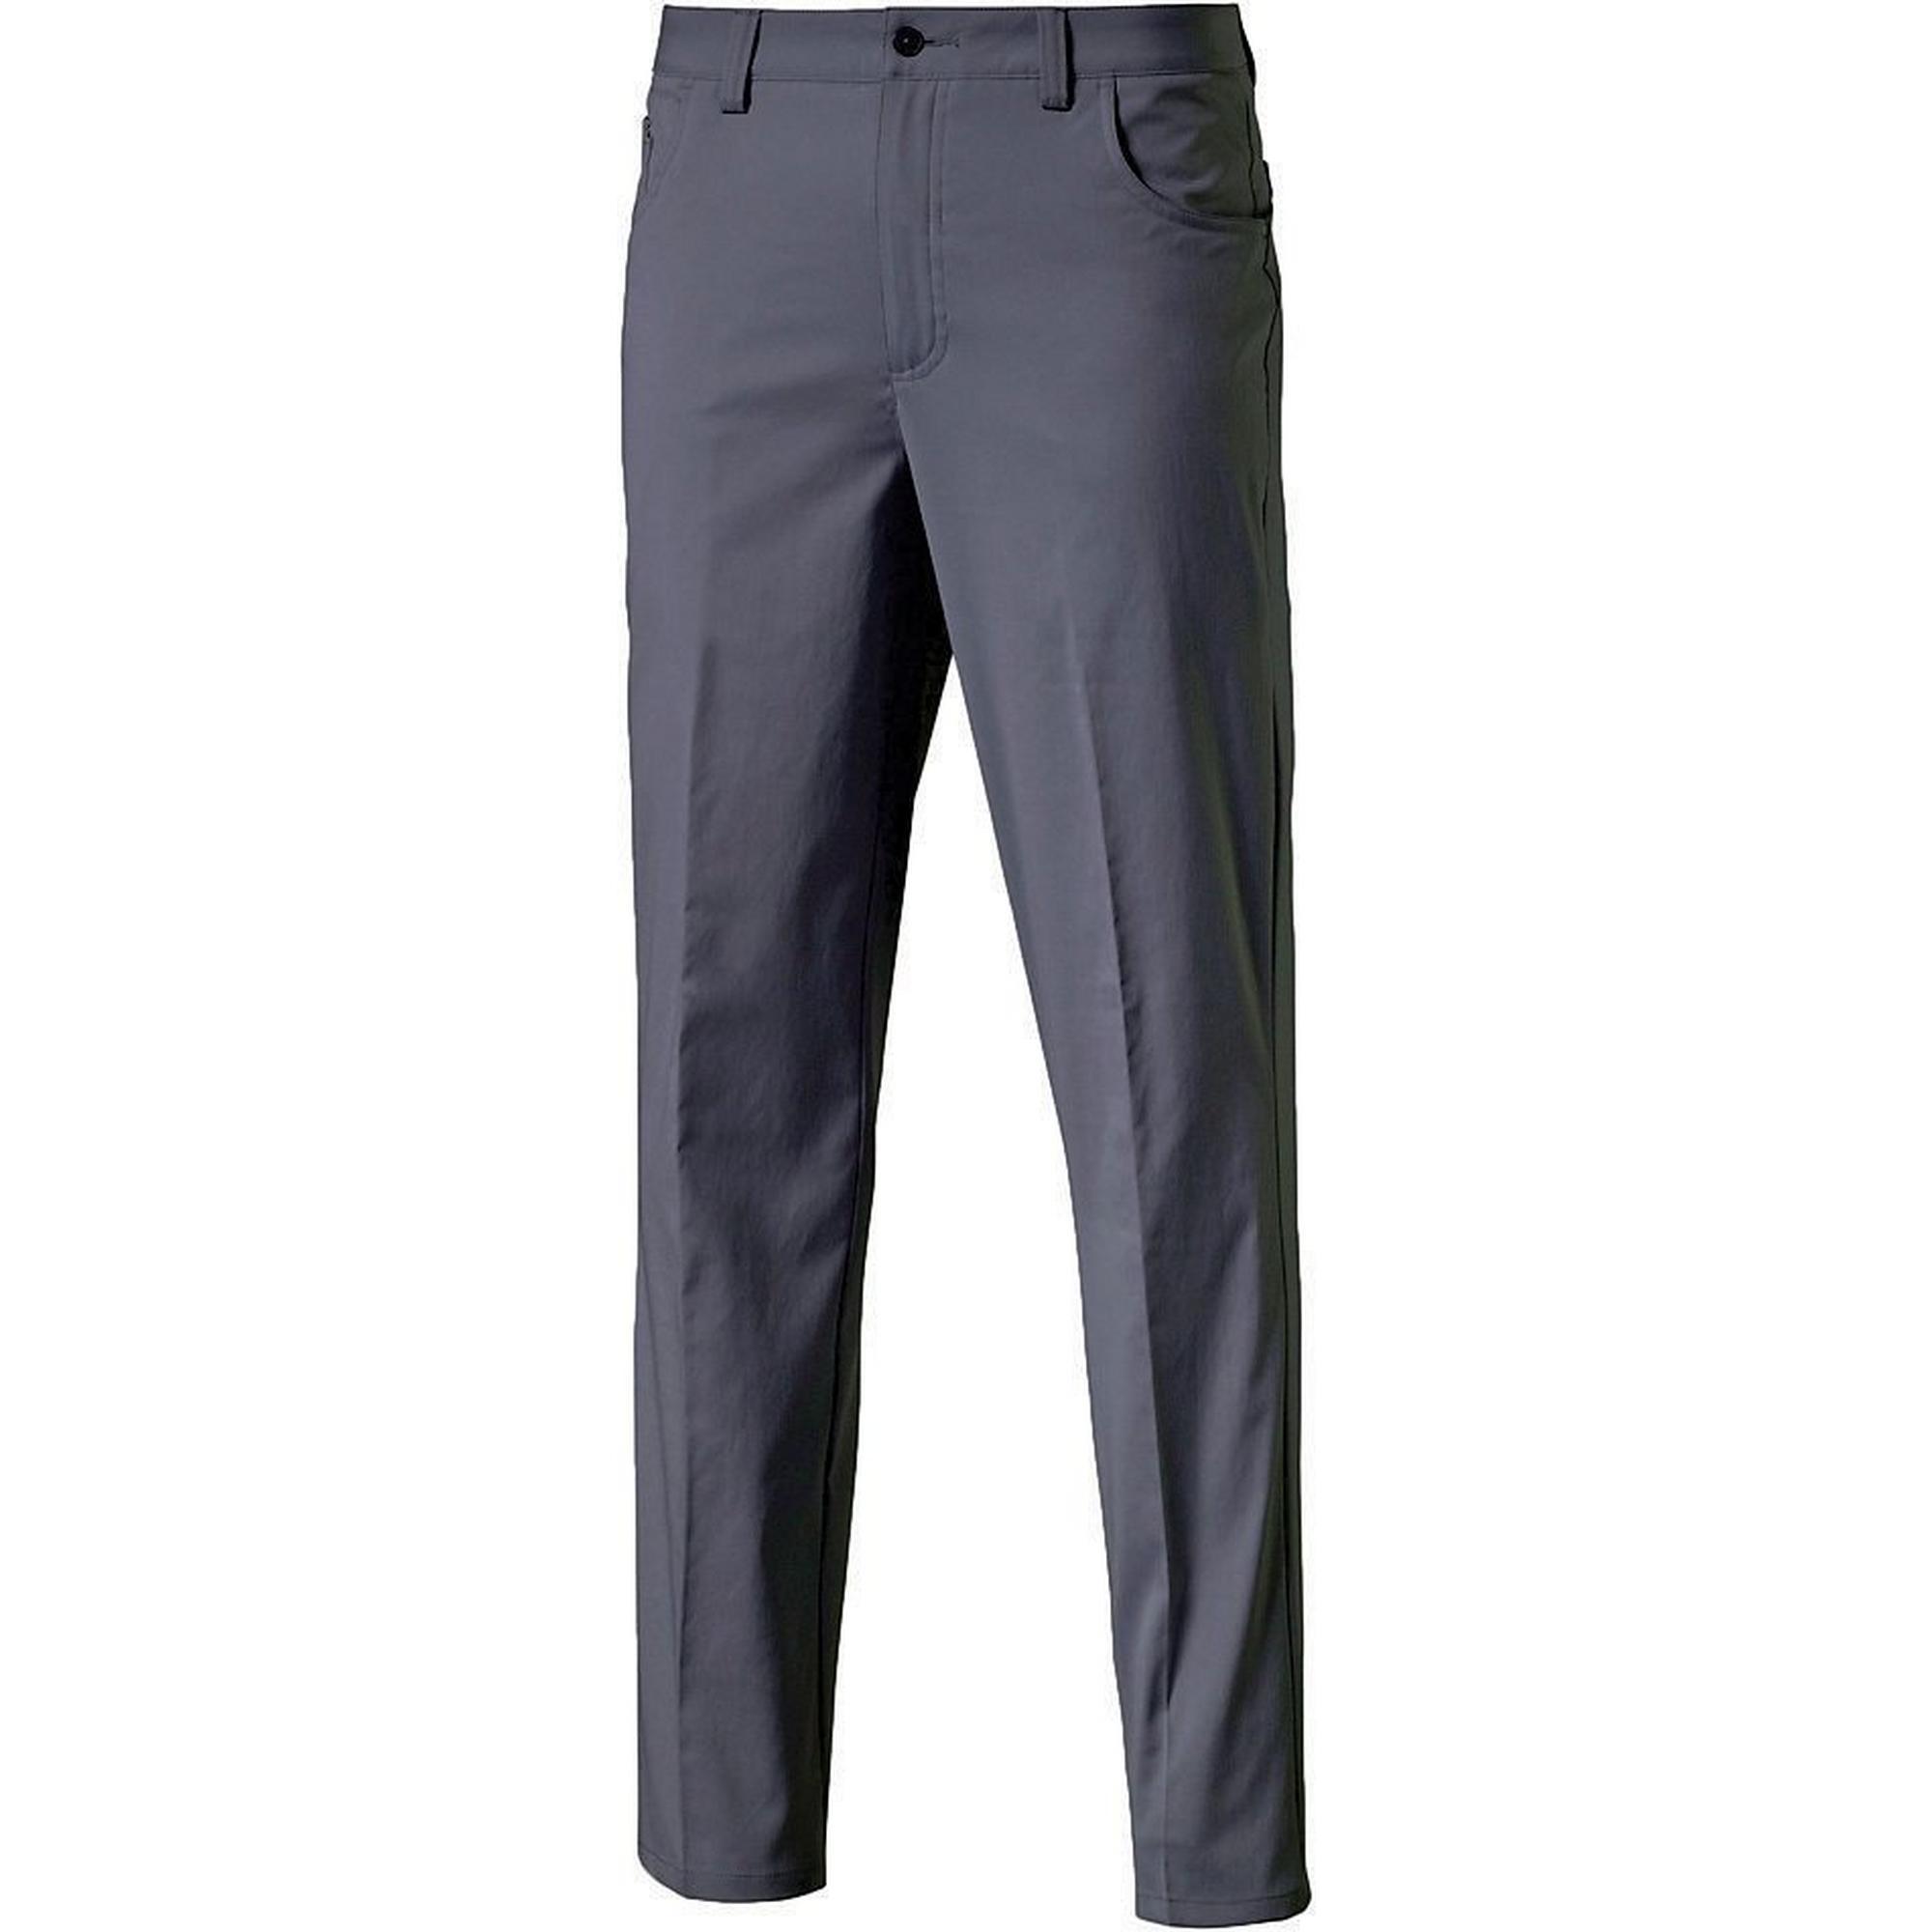 Men's 6 Pocket Pants